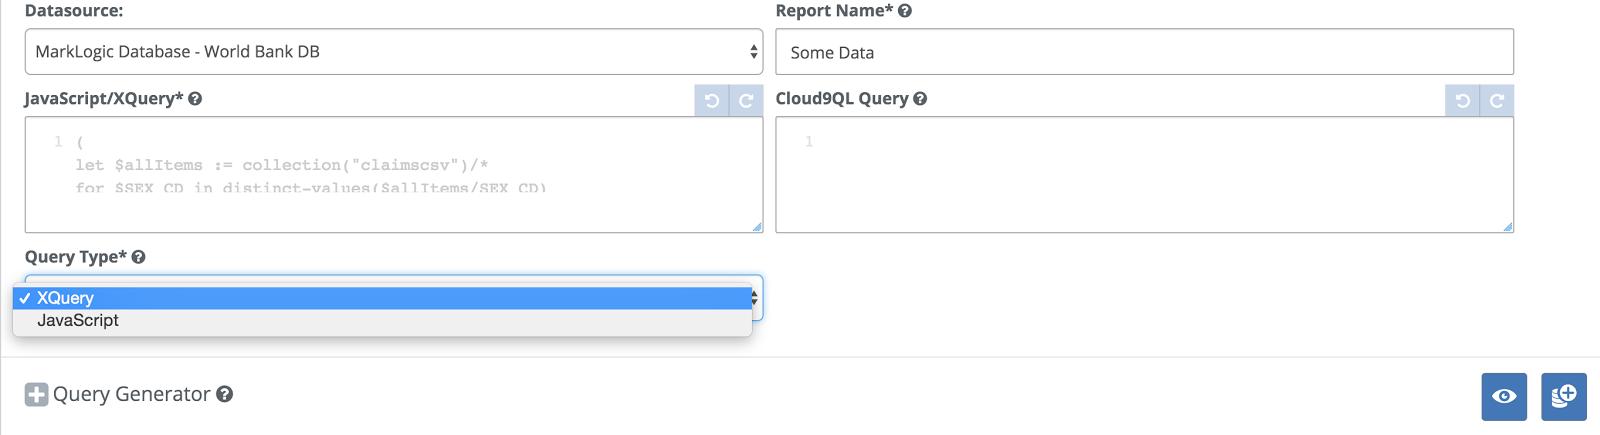 JavaScript Query support for MarkLogic + MarkLogic World